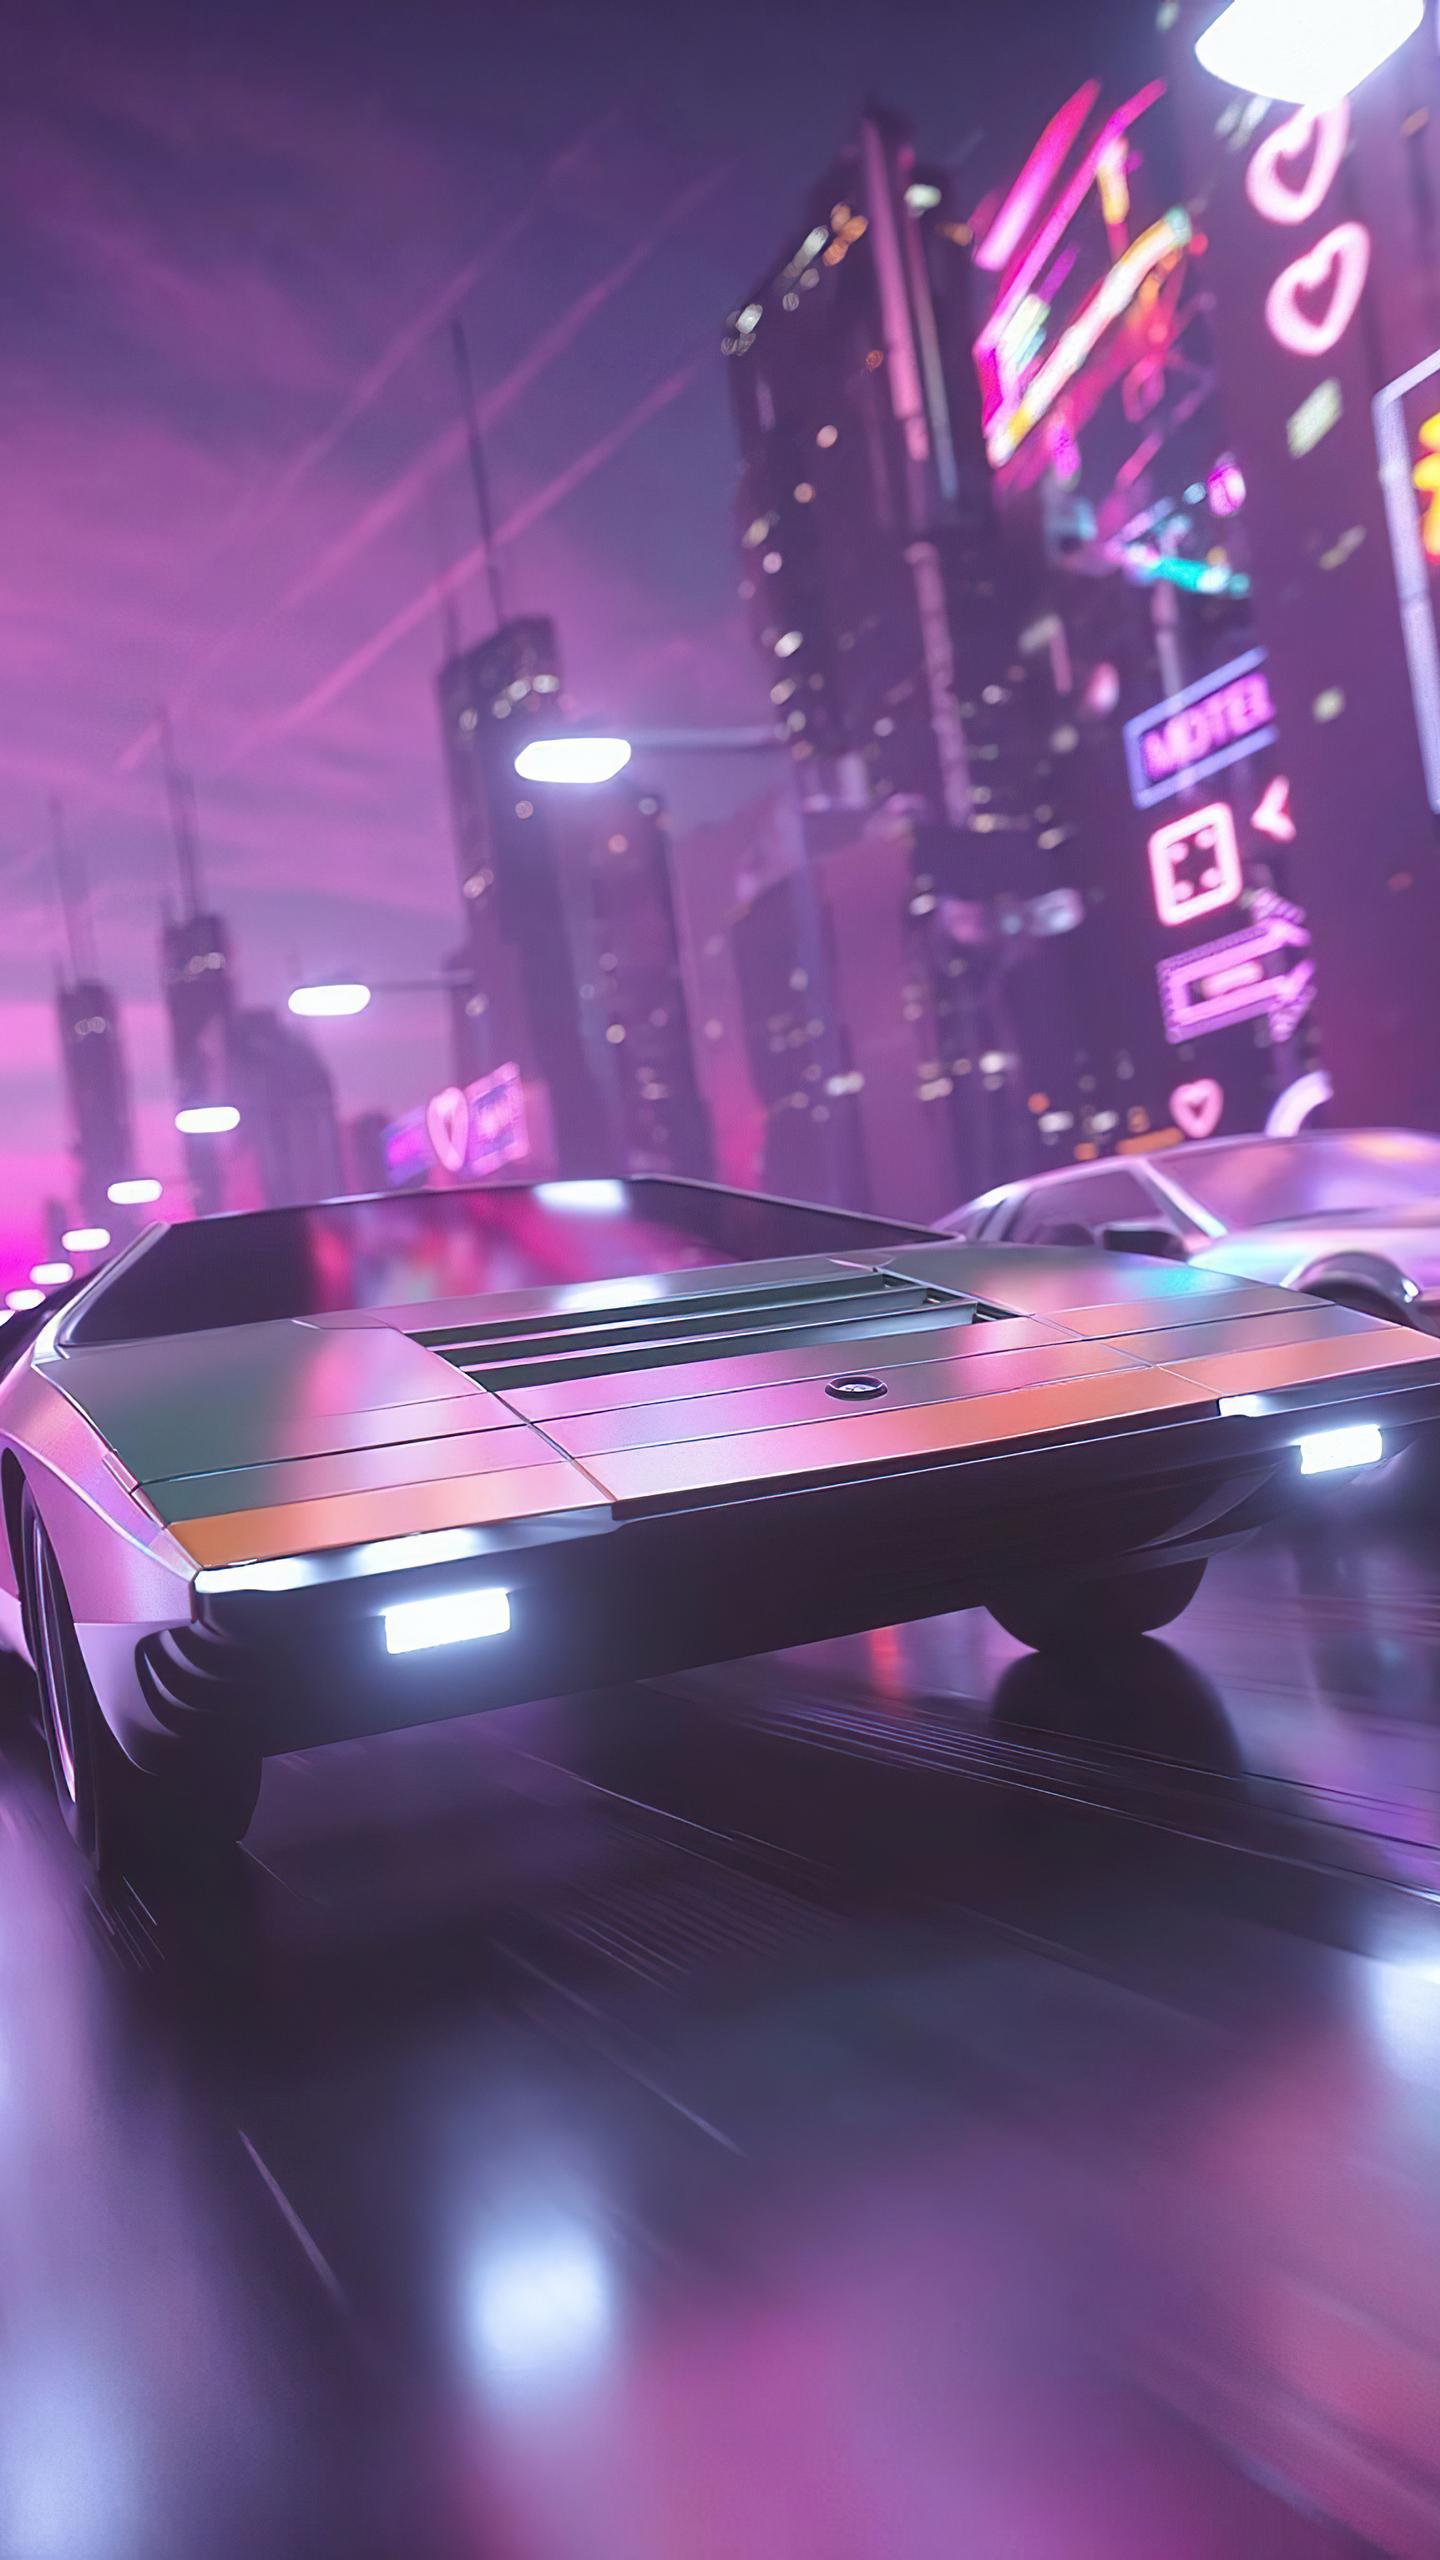 delorean-retro-viper-car-4k-uk.jpg